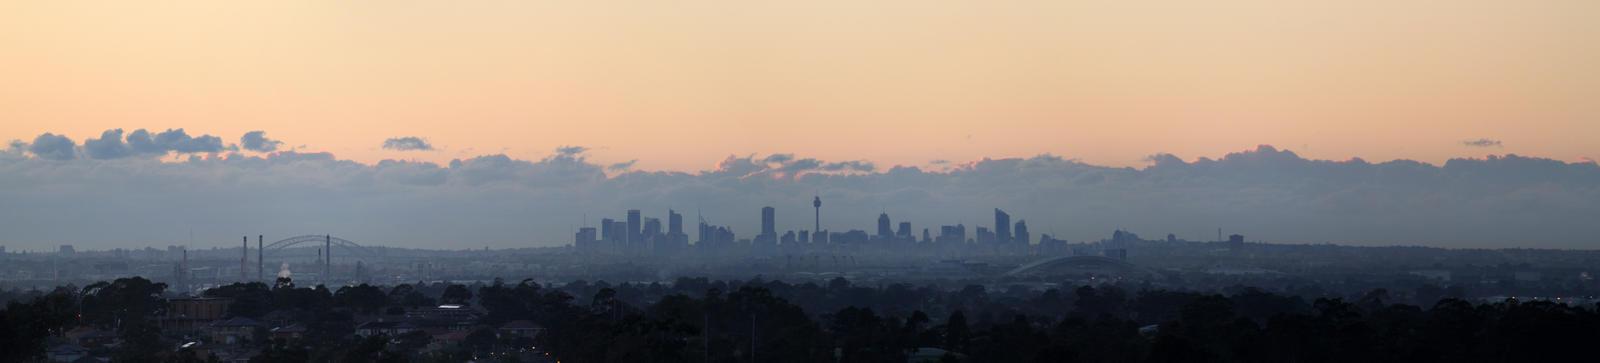 Sydney Horizon by TarJakArt